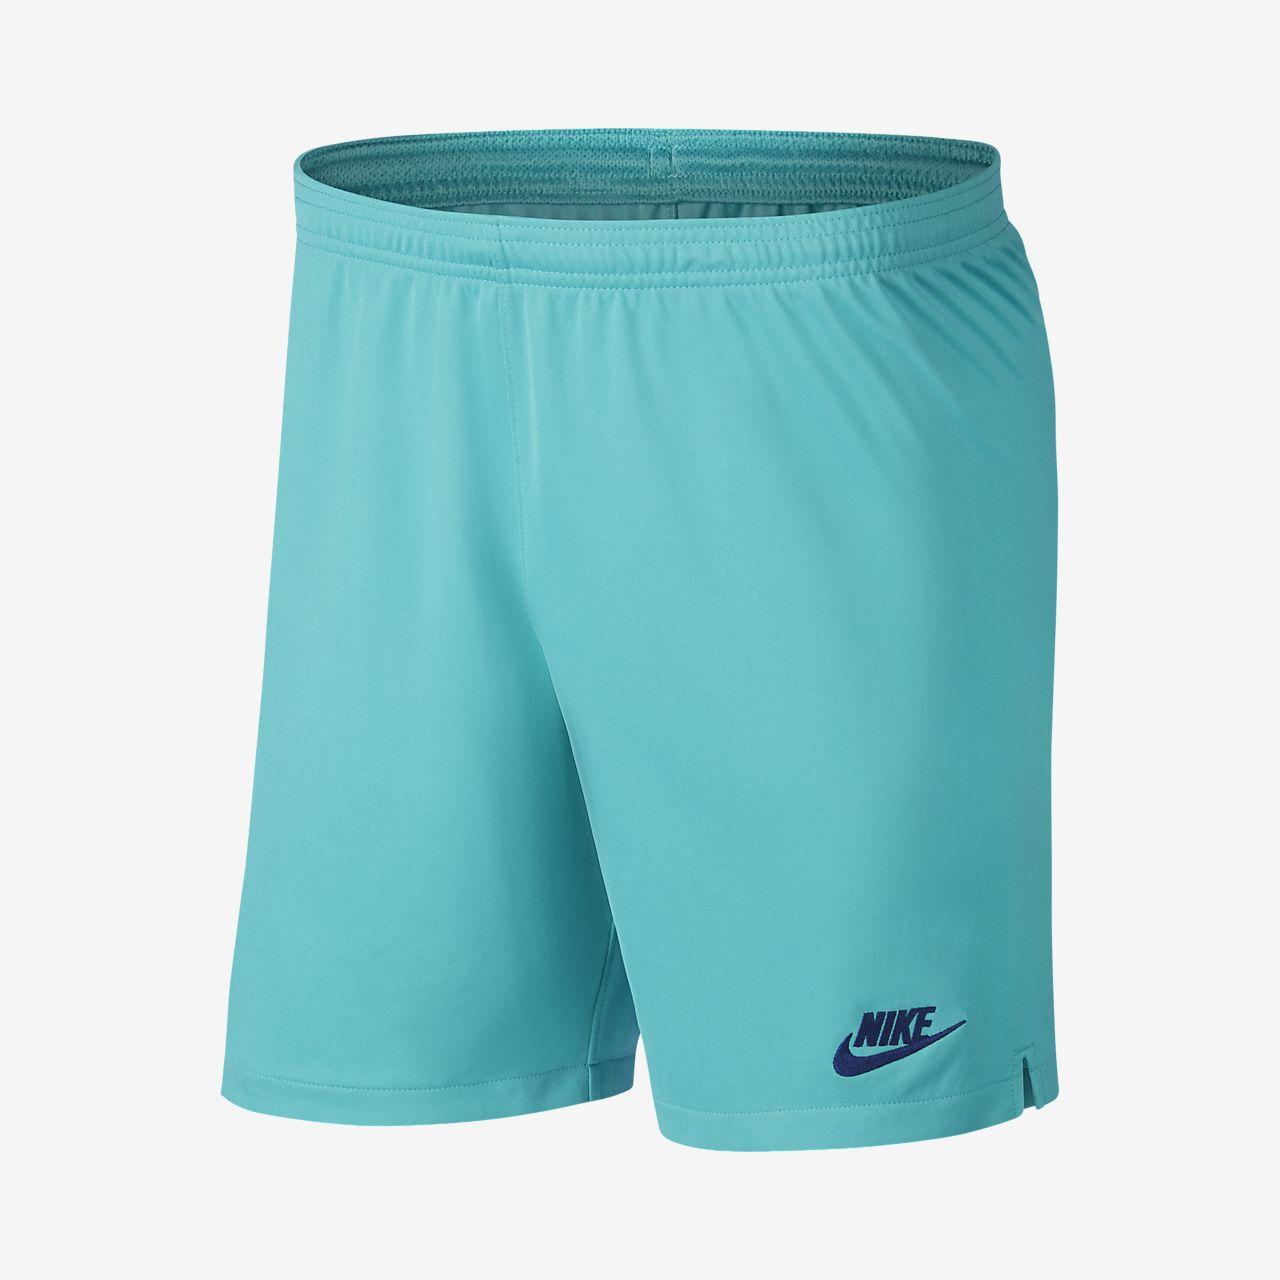 FC Barcelona 2019/20 Stadium Third Men's Football Shorts